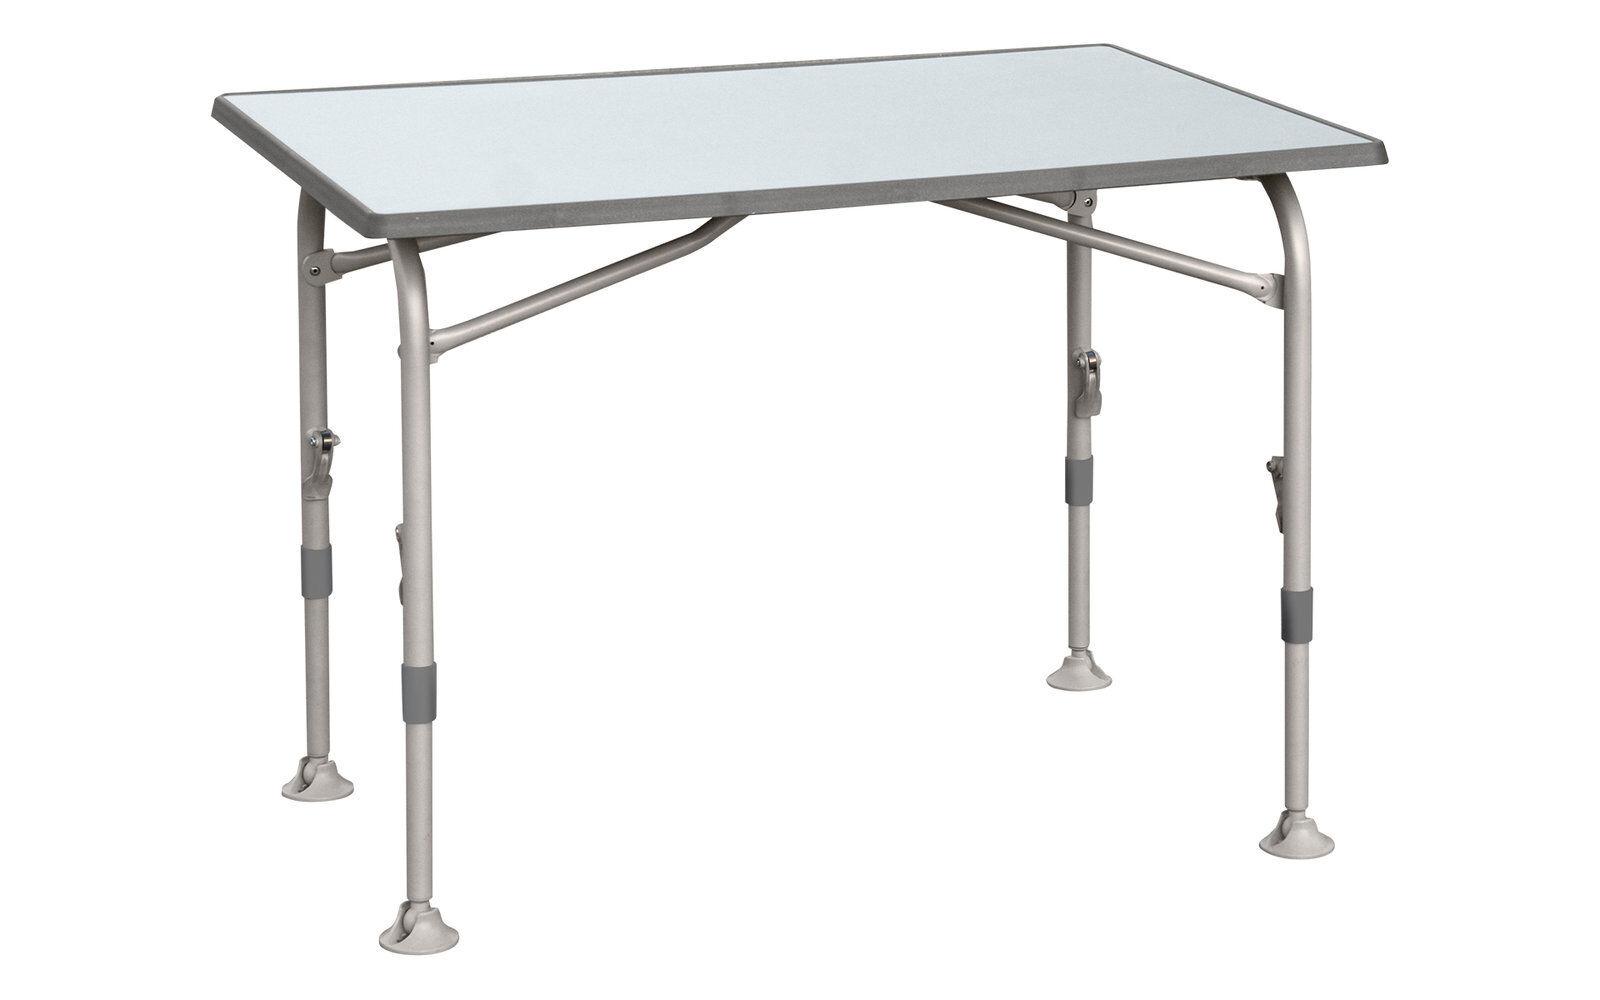 Berger Tisch Aluminium Aluminium Tisch Campingtisch Alu Klapptisch Falttisch Gartentisch Camping 52483a